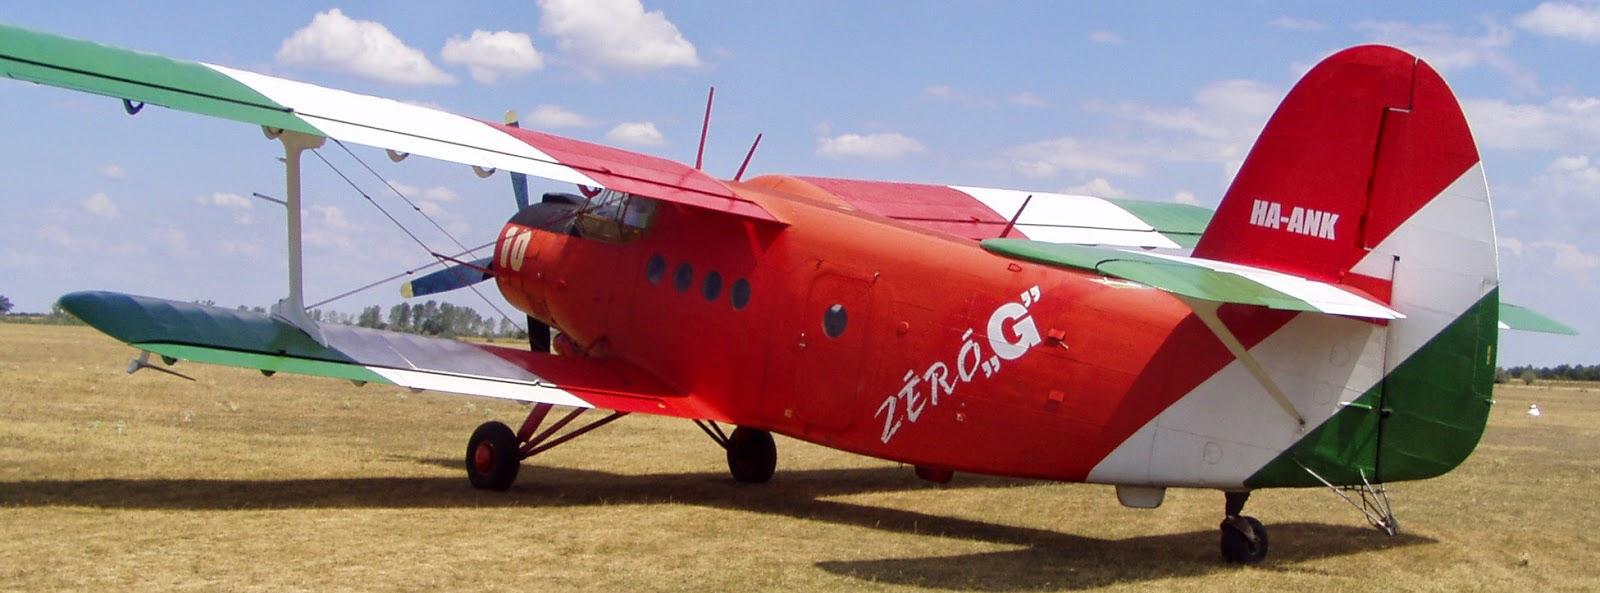 Festmenyek 3d ben 575 - Above Hires Juci Bacsi S Photo Hungarian An 2 Ancsa 1 At B Rg Nd Airfield